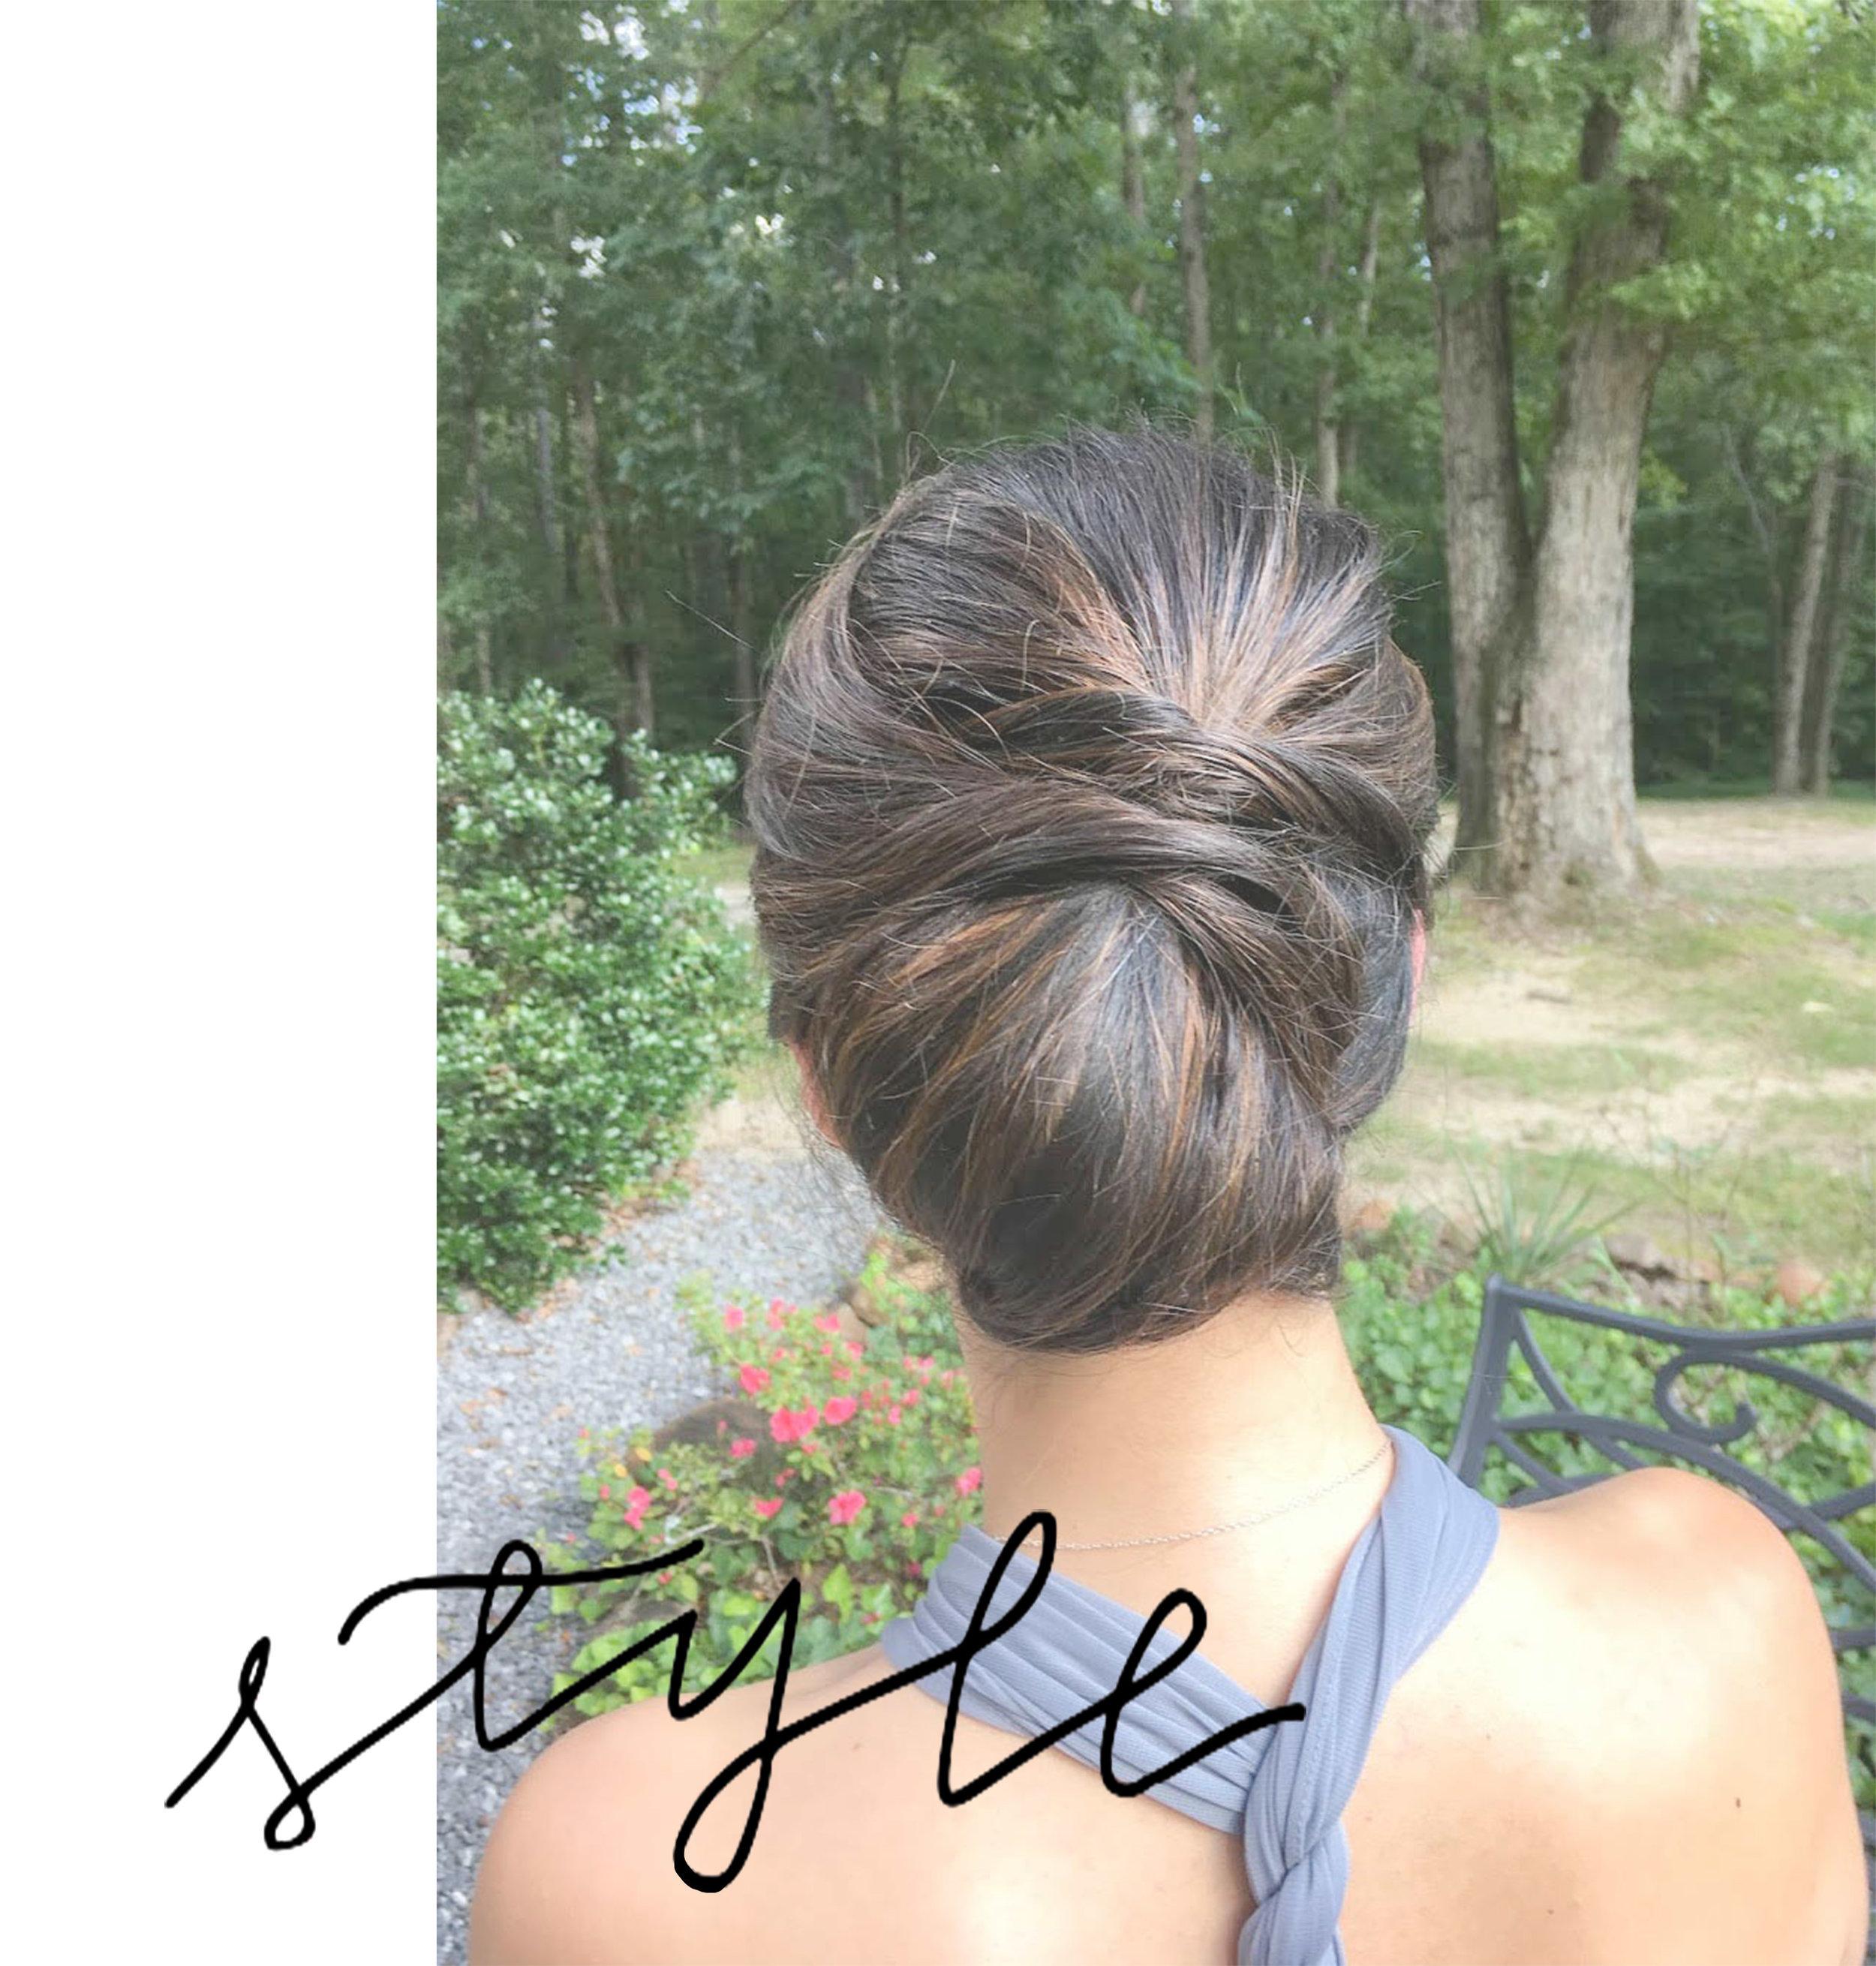 style stock image.jpg